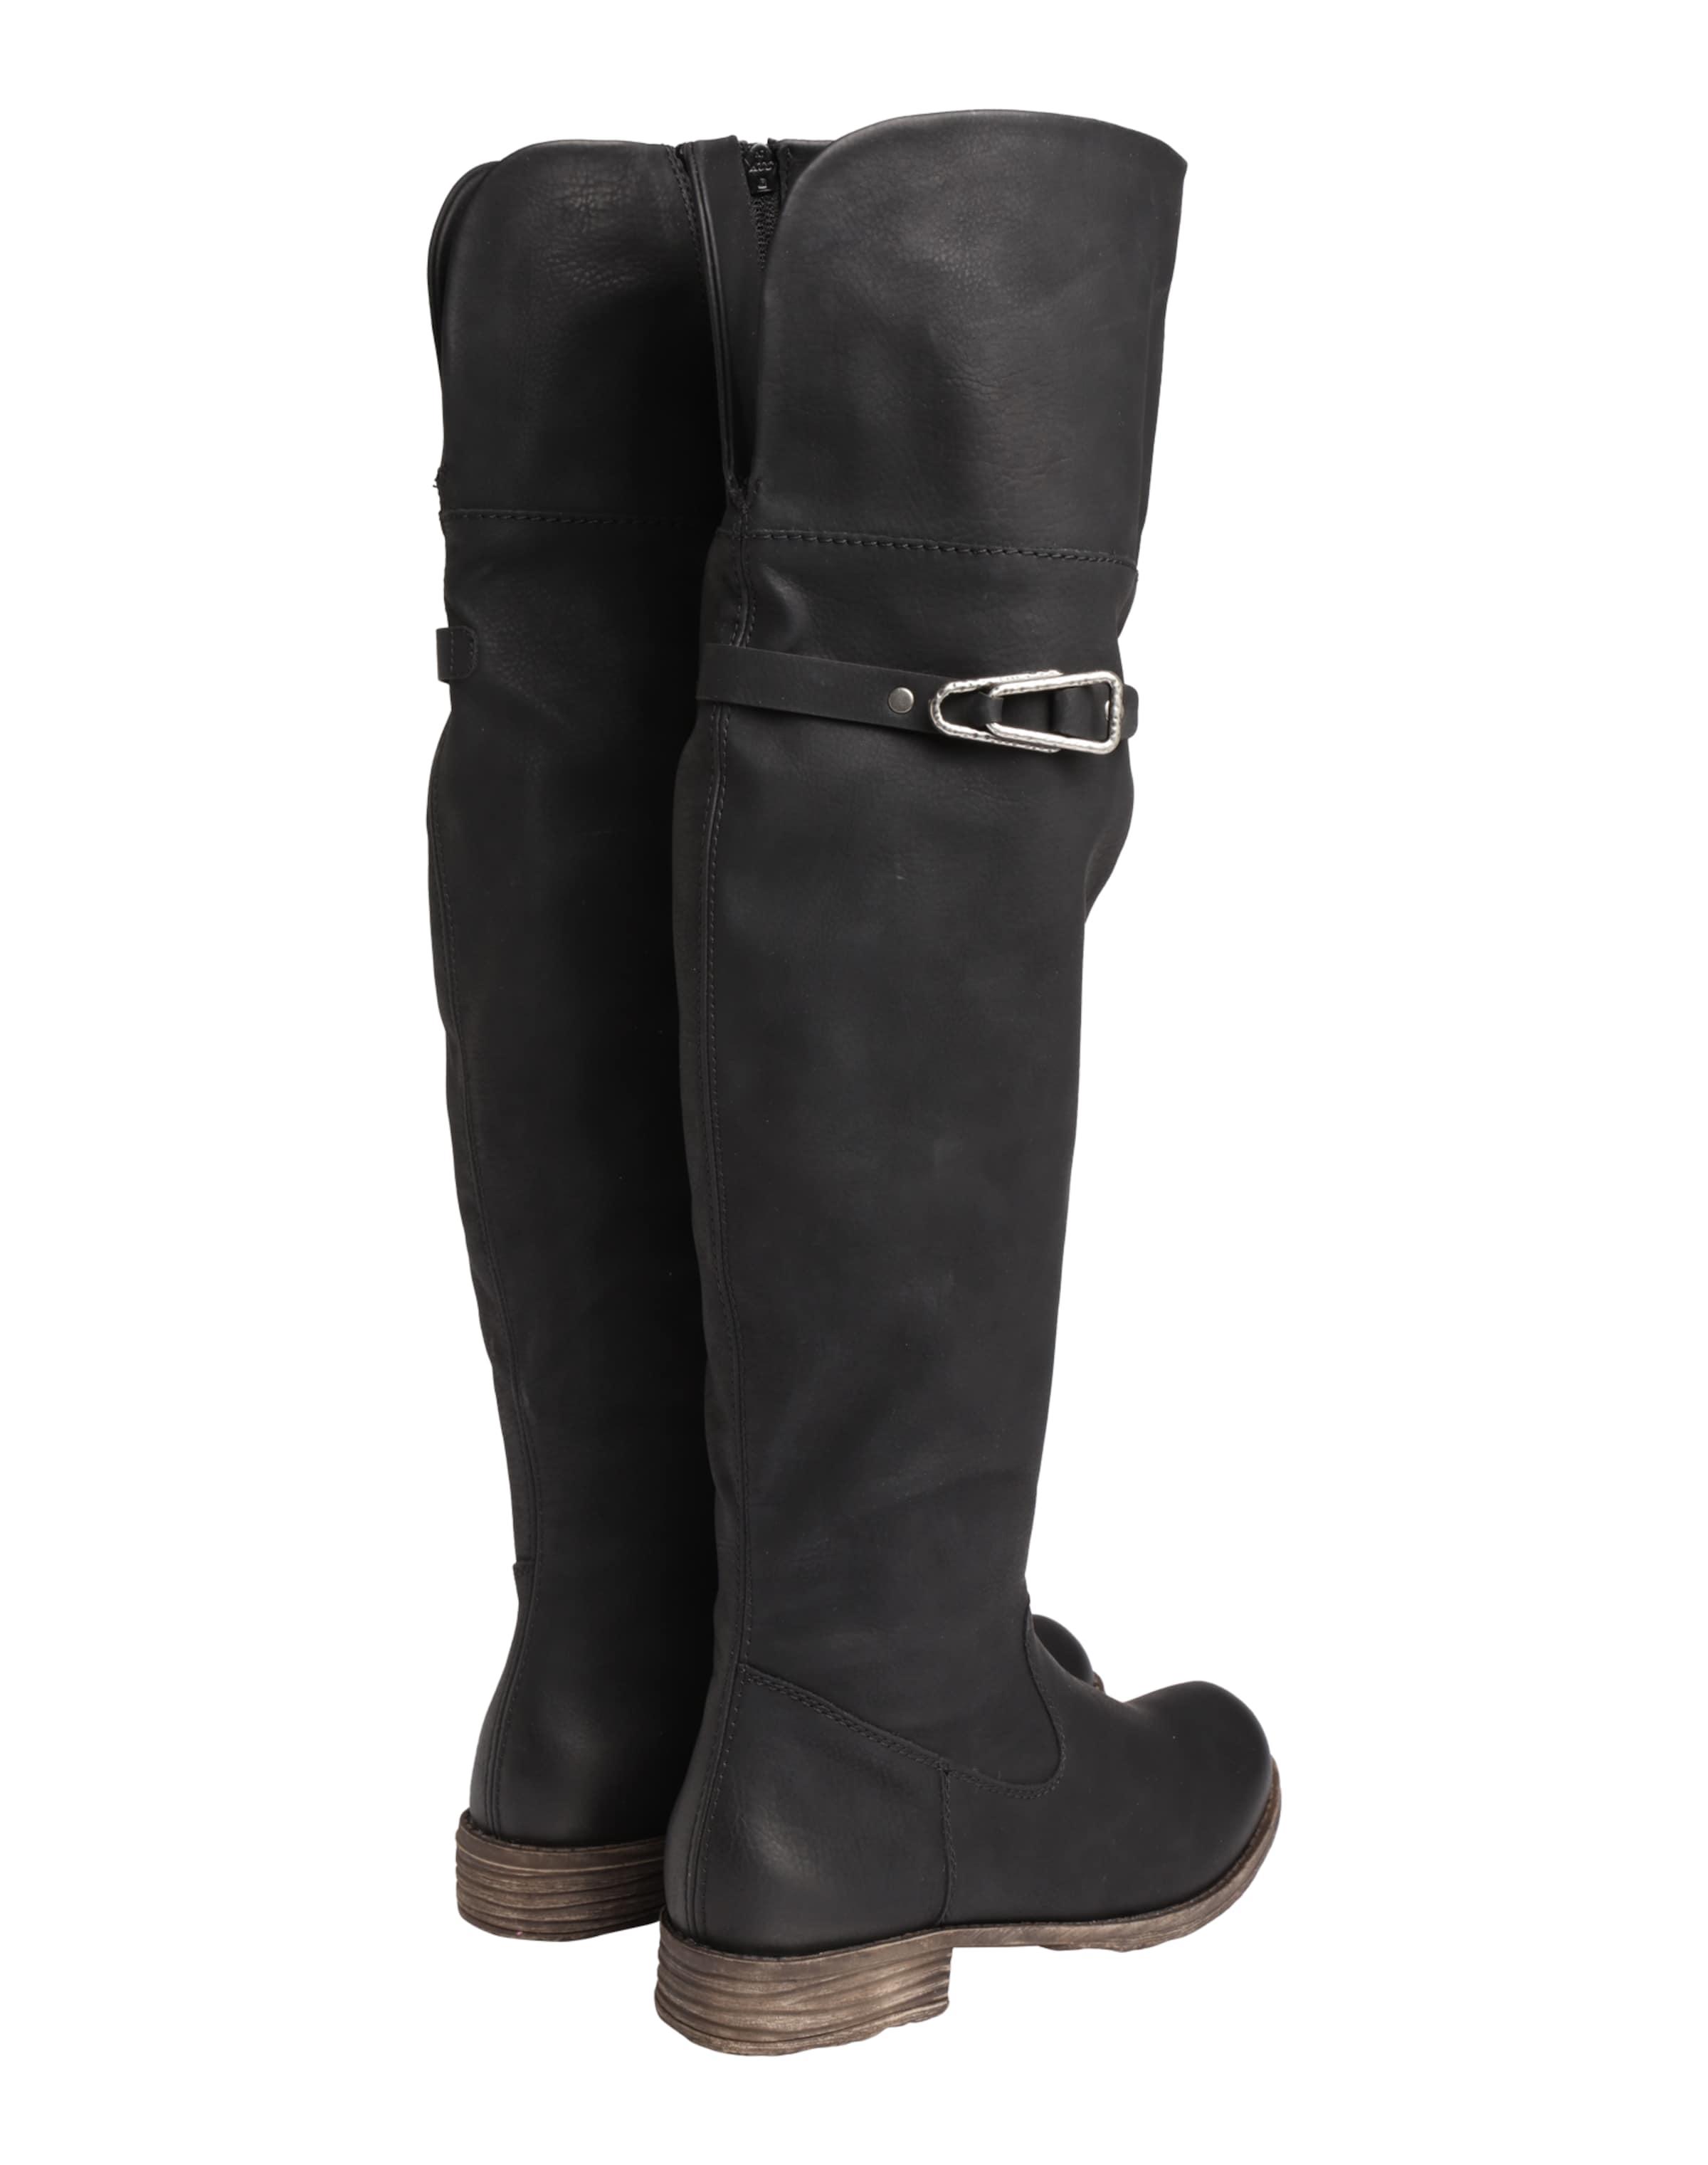 RIEKER Overknee mit Zierschnalle Outlet-Store Verkauf Erschwinglich Rabatt Footlocker qOH2zk